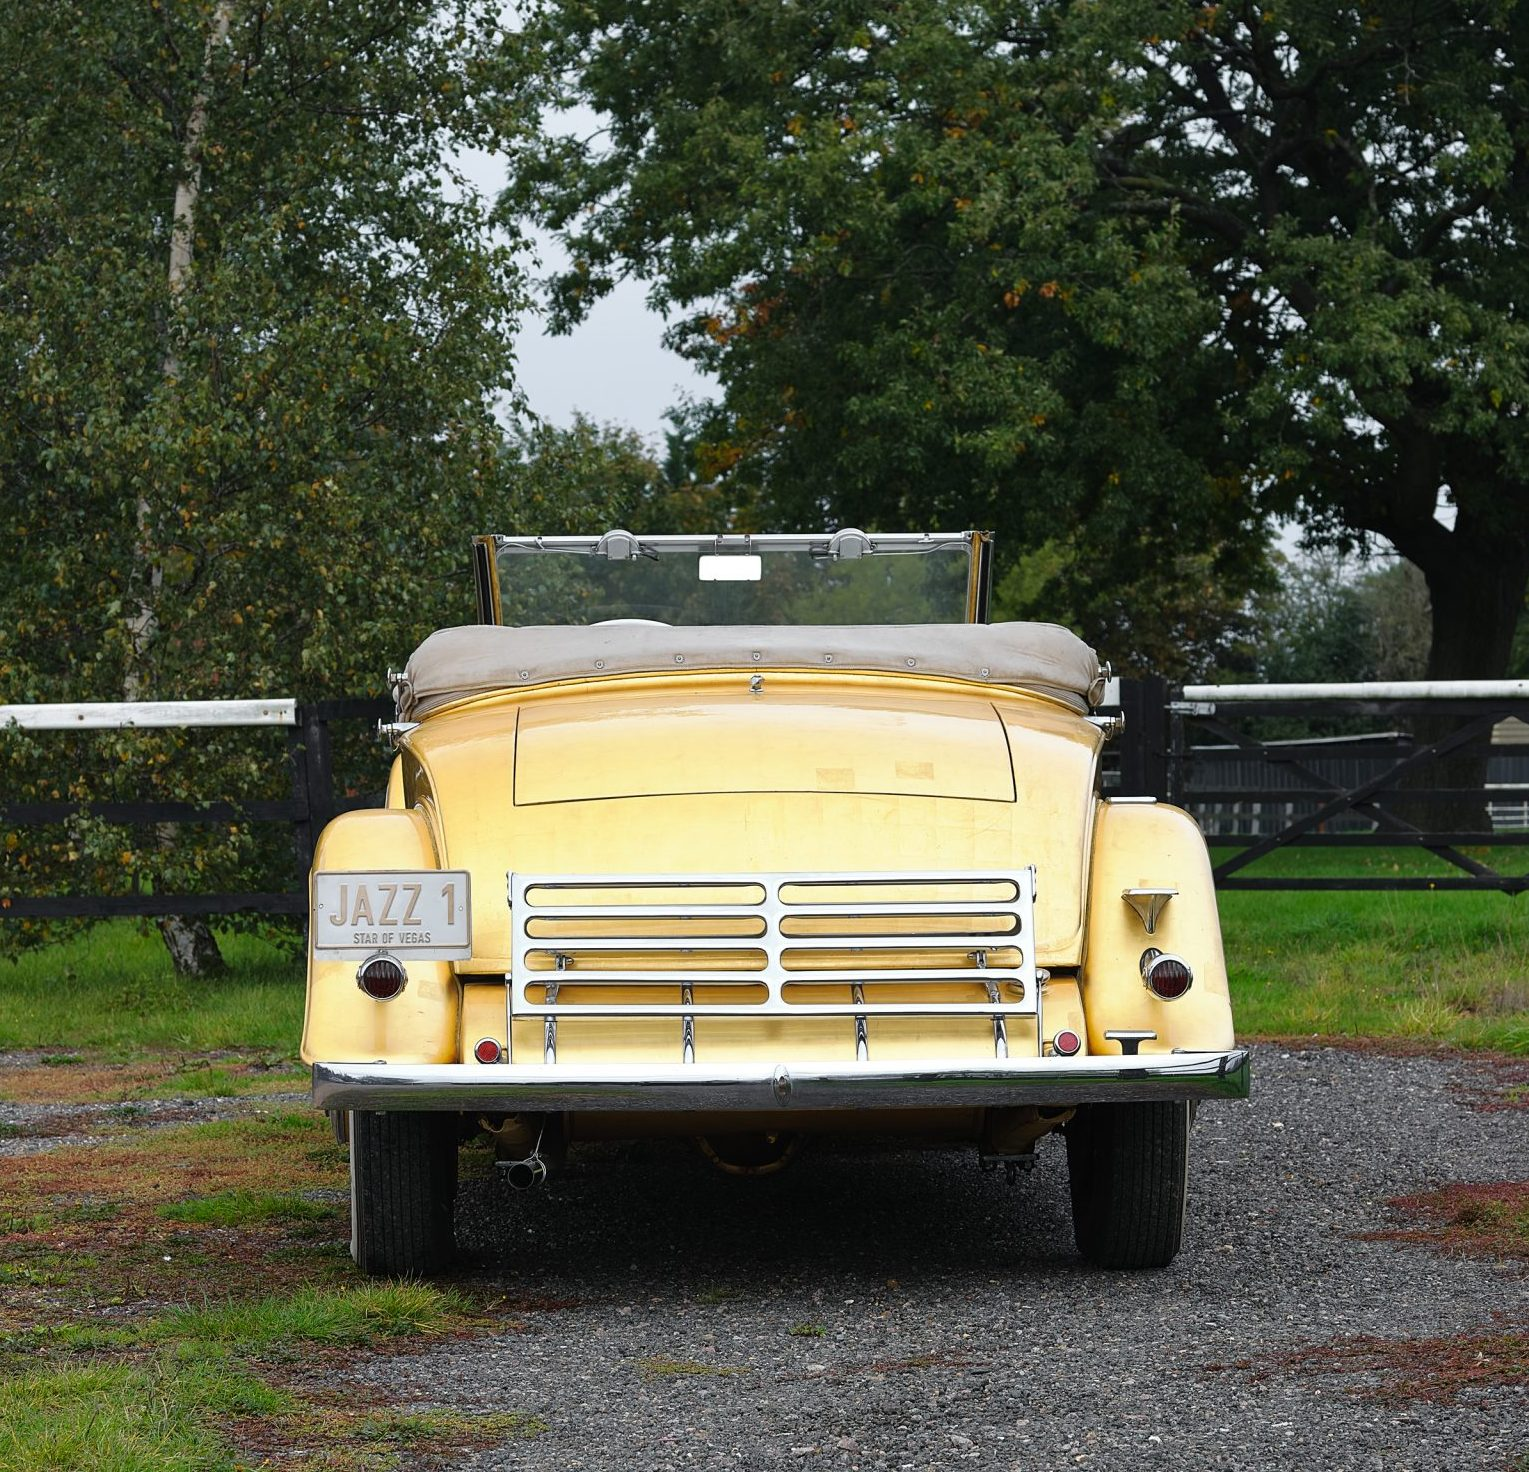 1931 Cadillac V-8 Convertible Coupe rear